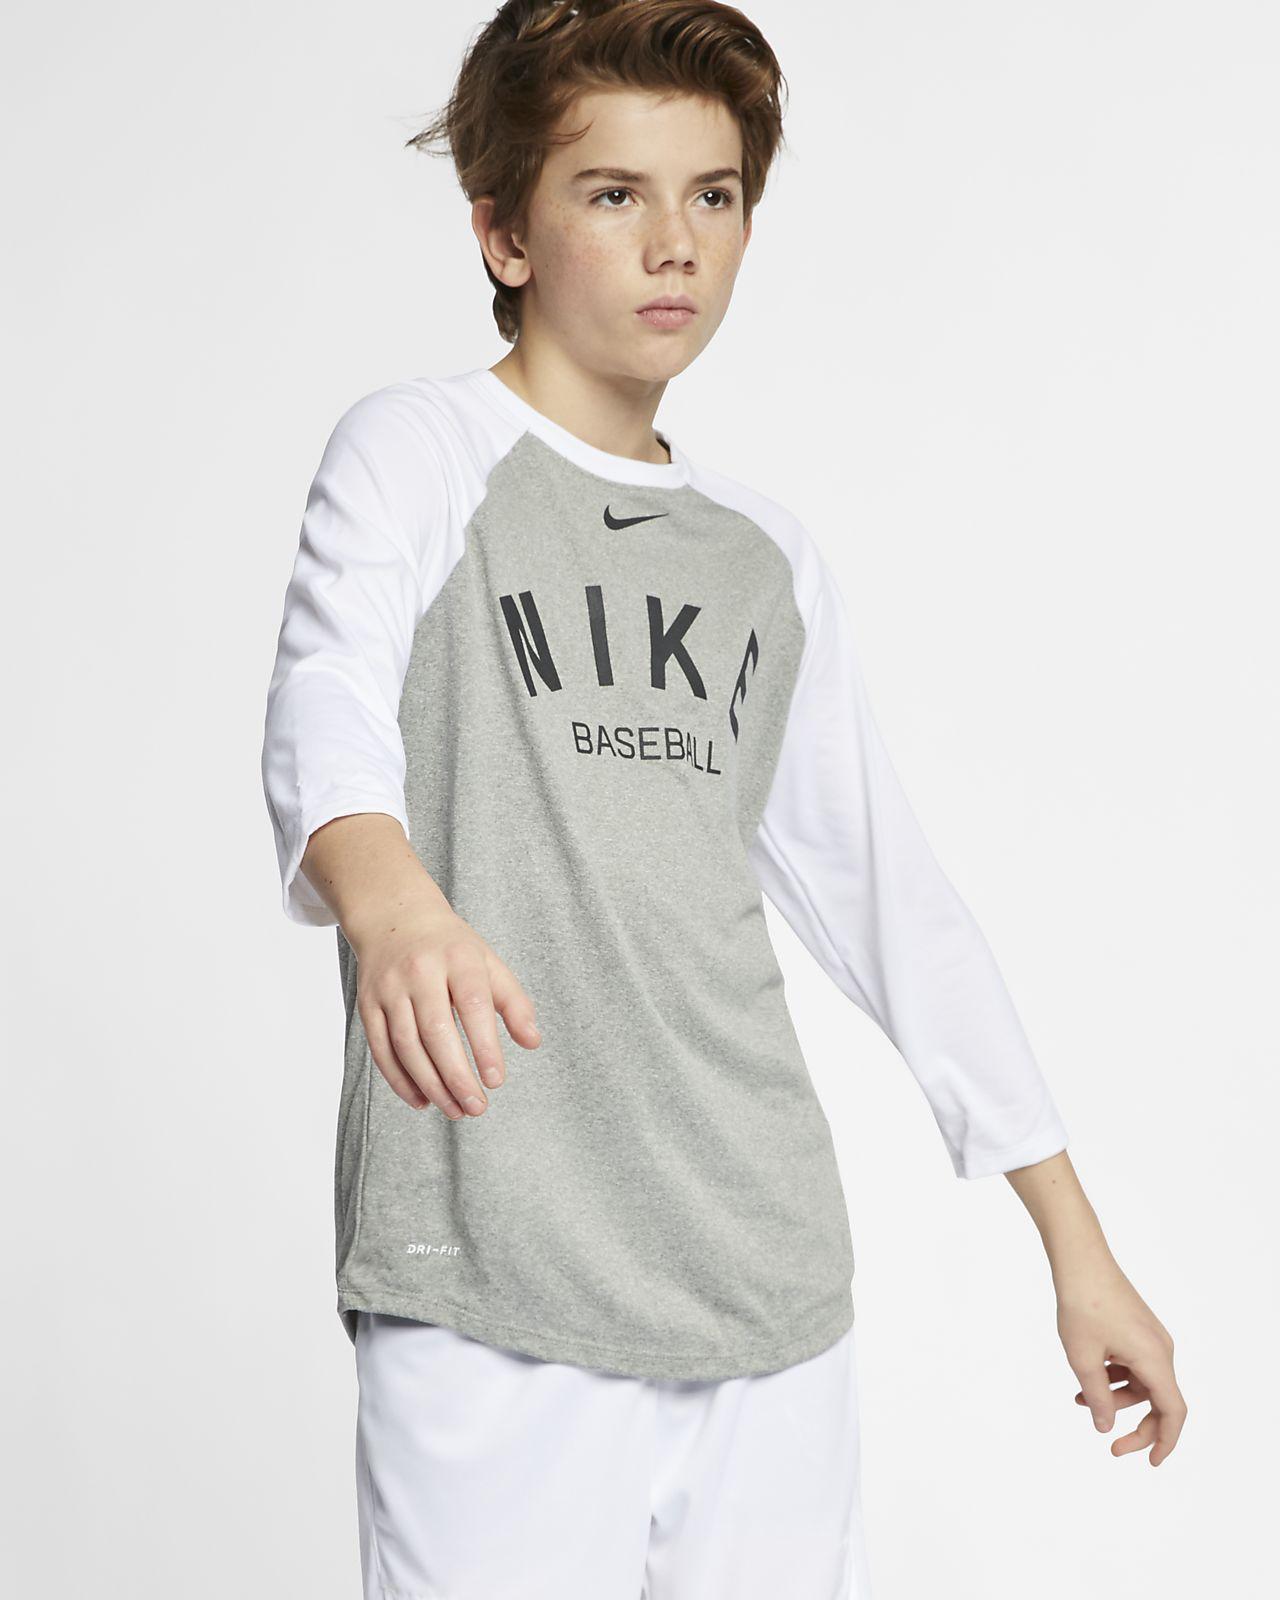 174ccdfea Nike Dri-FIT Big Kids' (Boys') 3/4-Sleeve Baseball T-Shirt. Nike.com